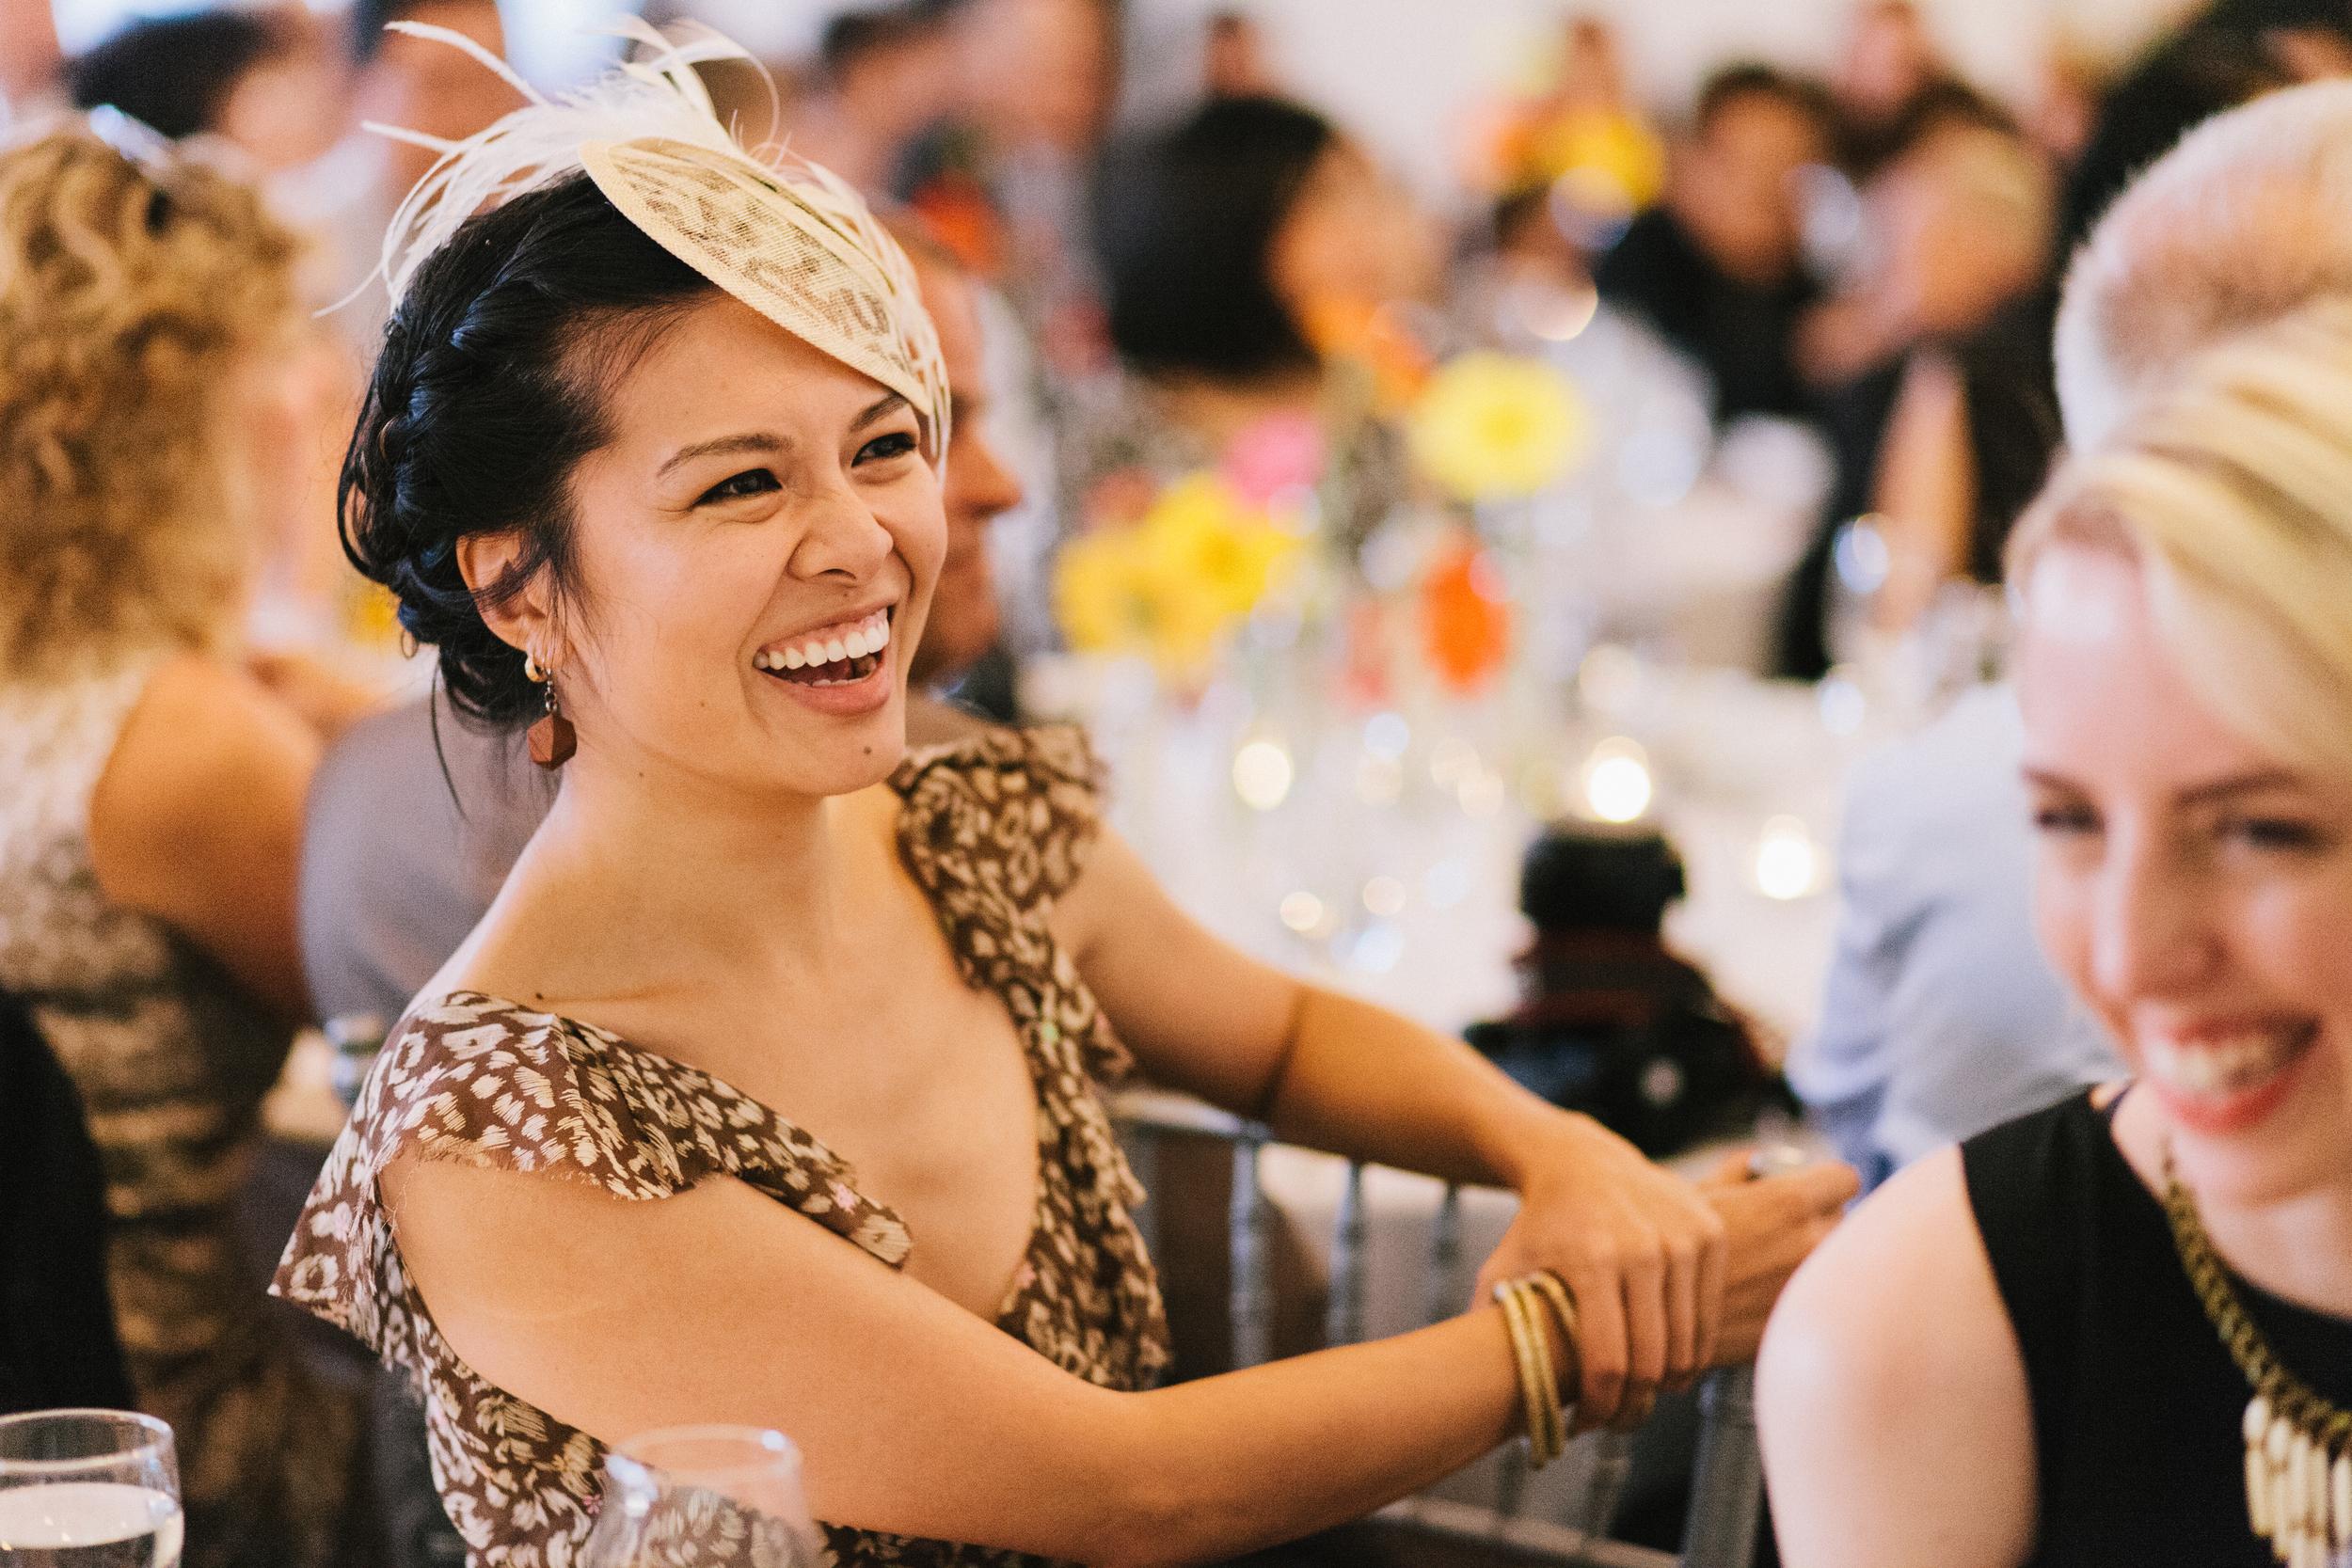 Berkeley-field-house-wedding-nicola-ken-086.jpg